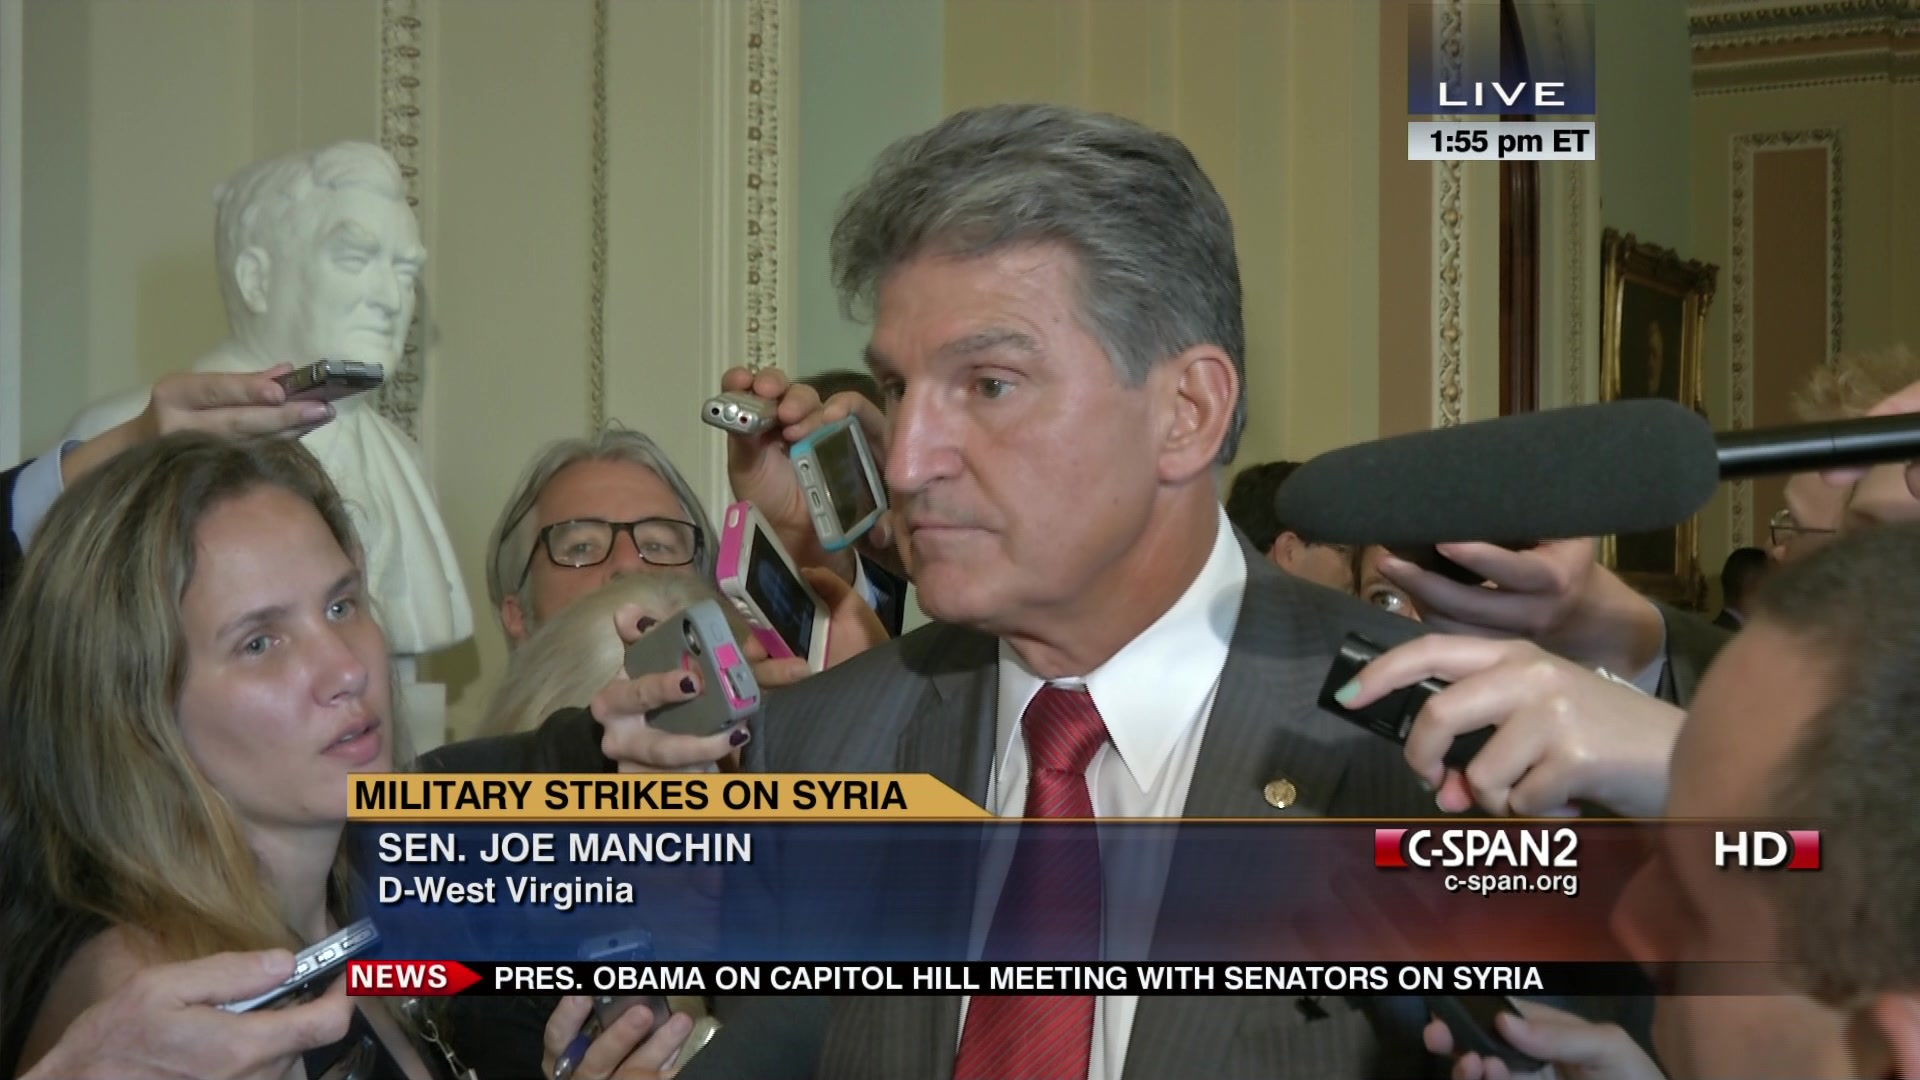 Senator Manchin on Syria